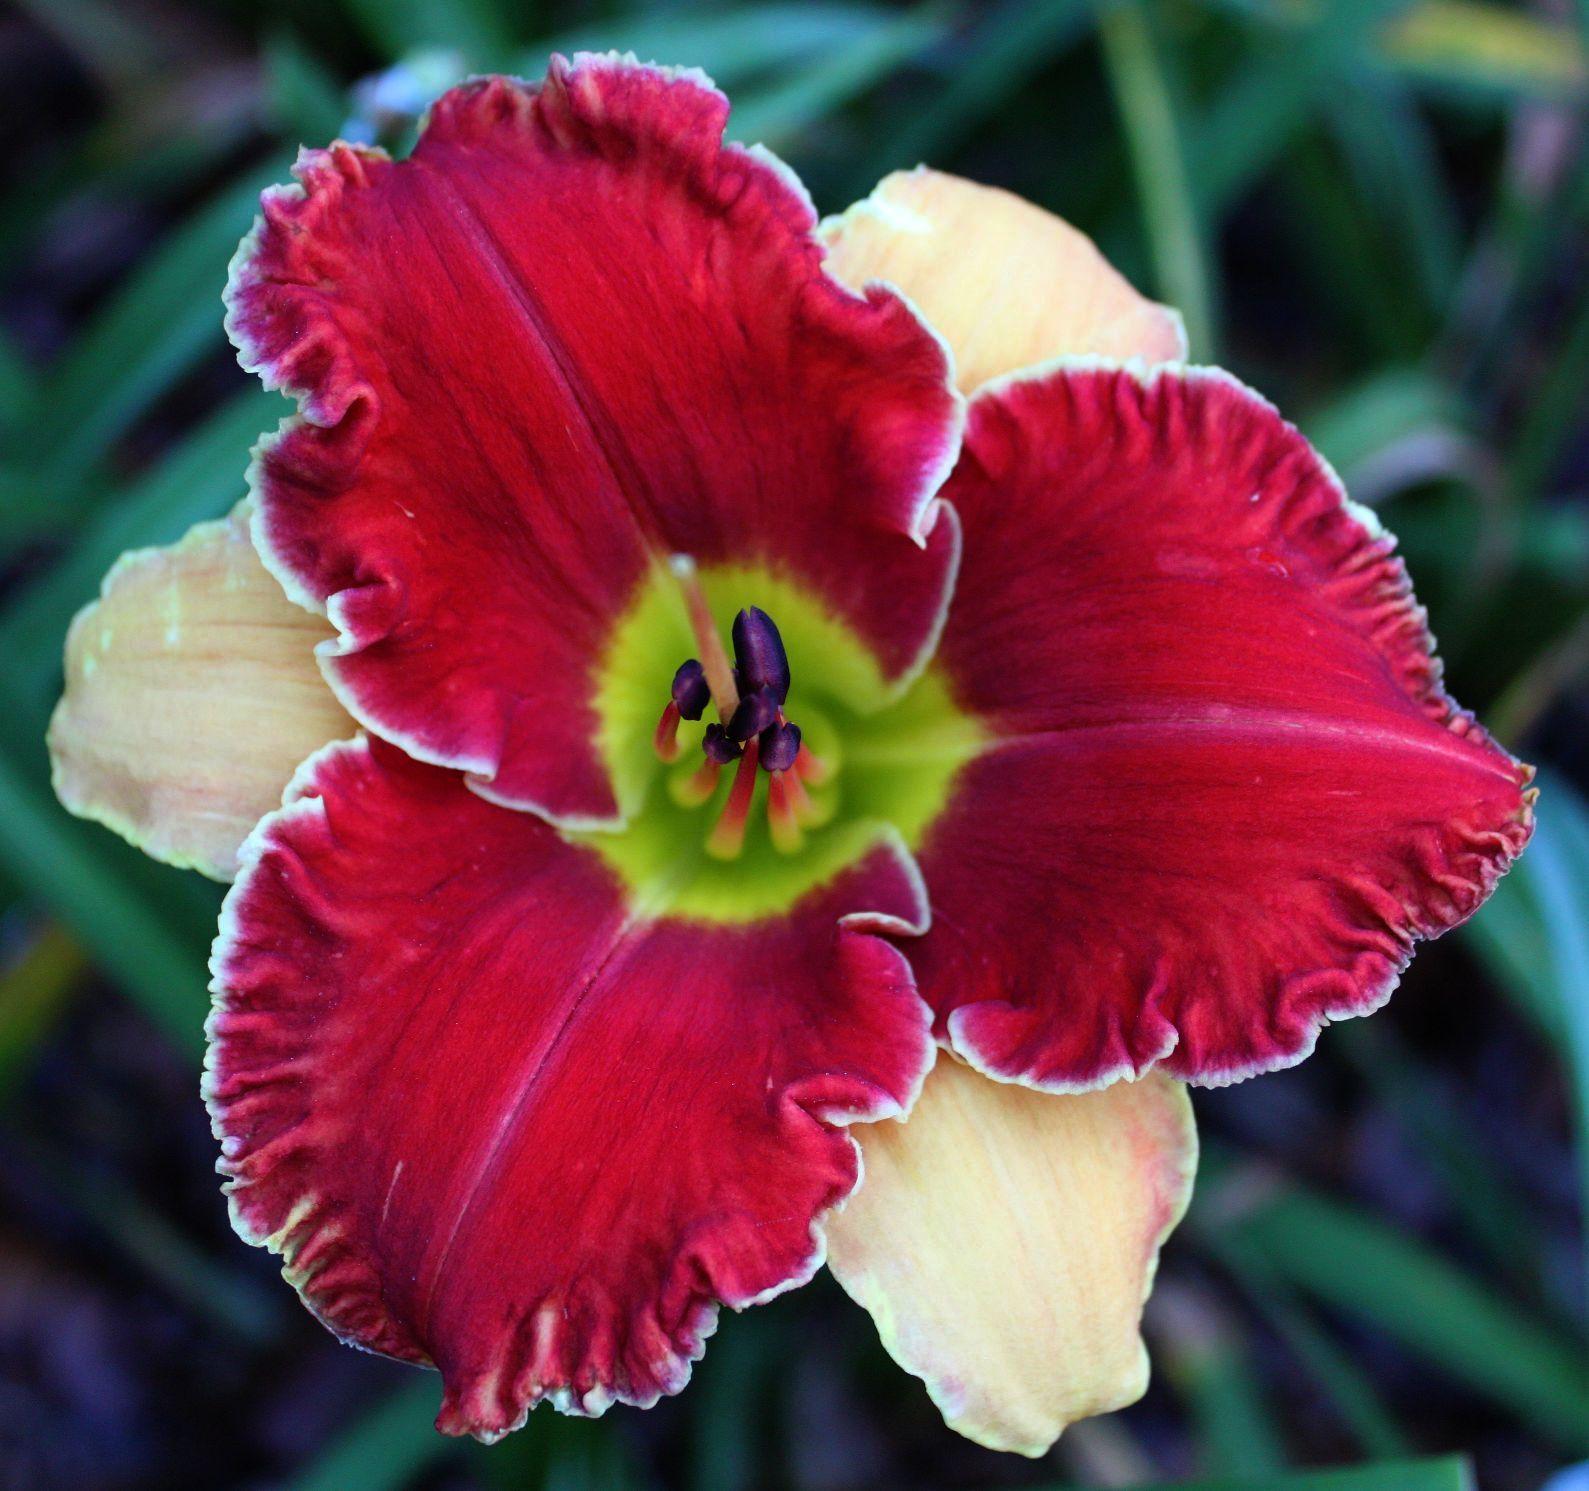 Daylily, Hemerocallis 'Whipped Cream And Strawberries